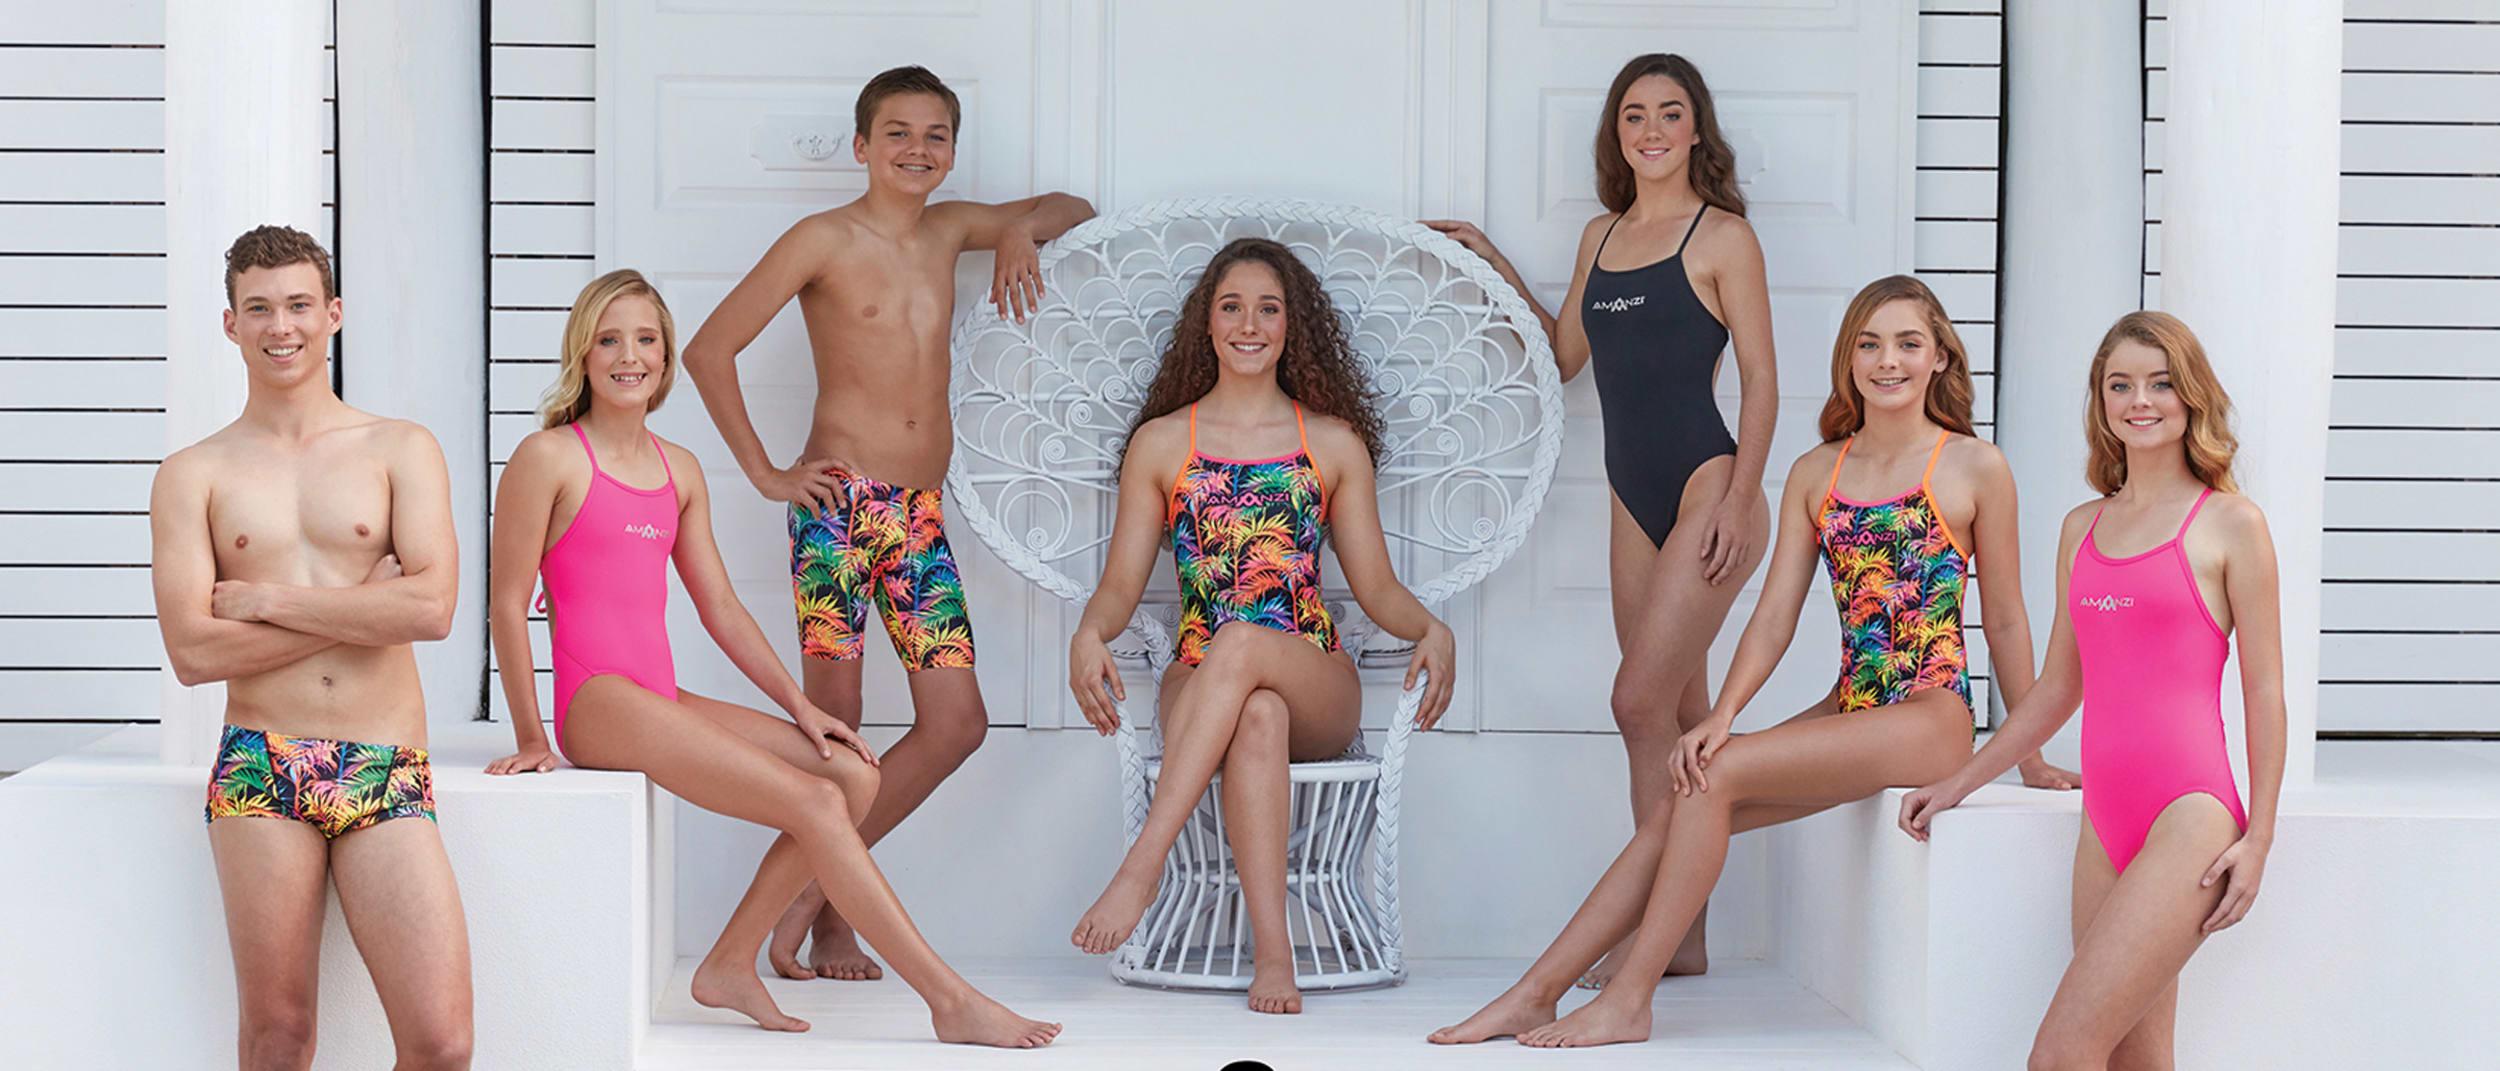 Sportsco: swim into spring